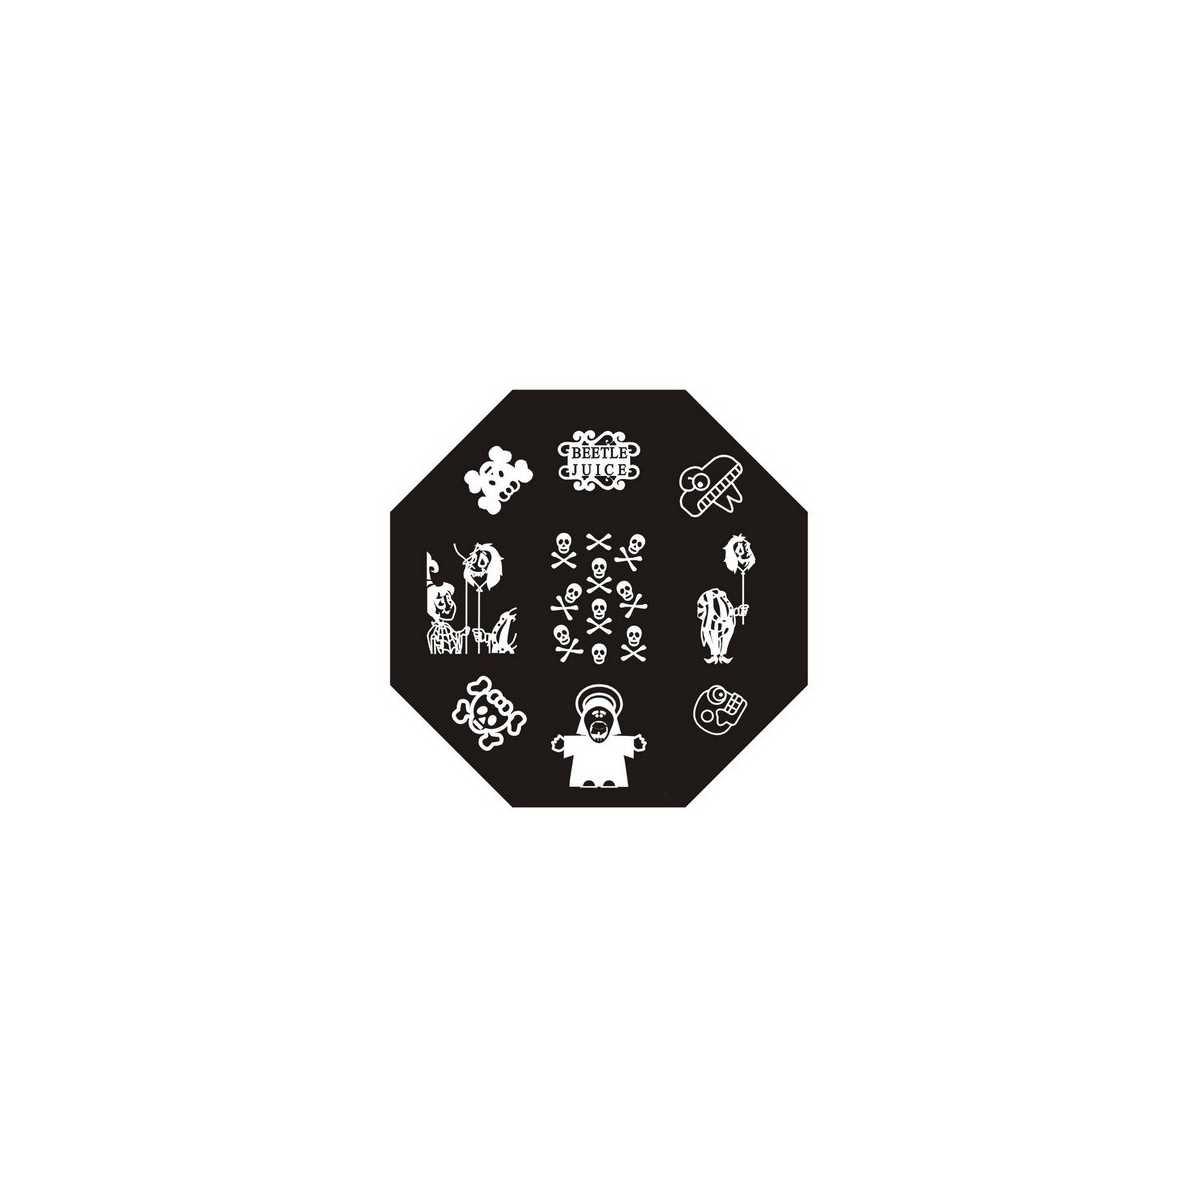 https://www.kit-manucure.com/625-thickbox_default/plaque-de-stamping-tête-de-mort-et-stamping-halloween.jpg